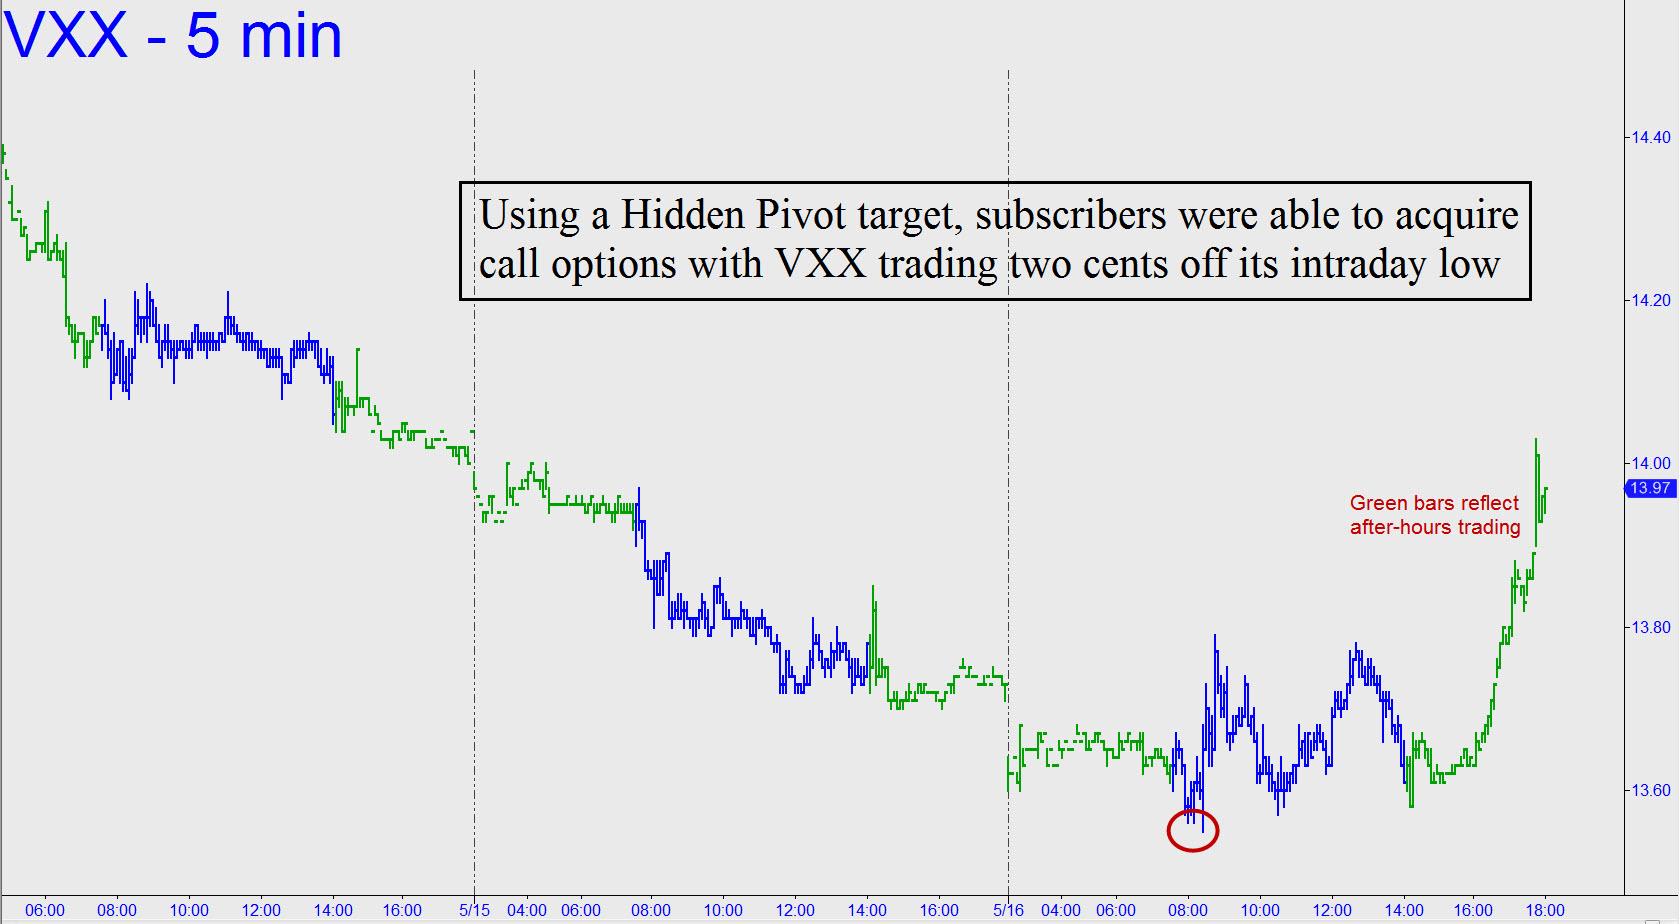 https://www.rickackerman.com/wp-content/uploads/2017/05/Bought-VXX-calls-two-ticks-off-their-low.jpg